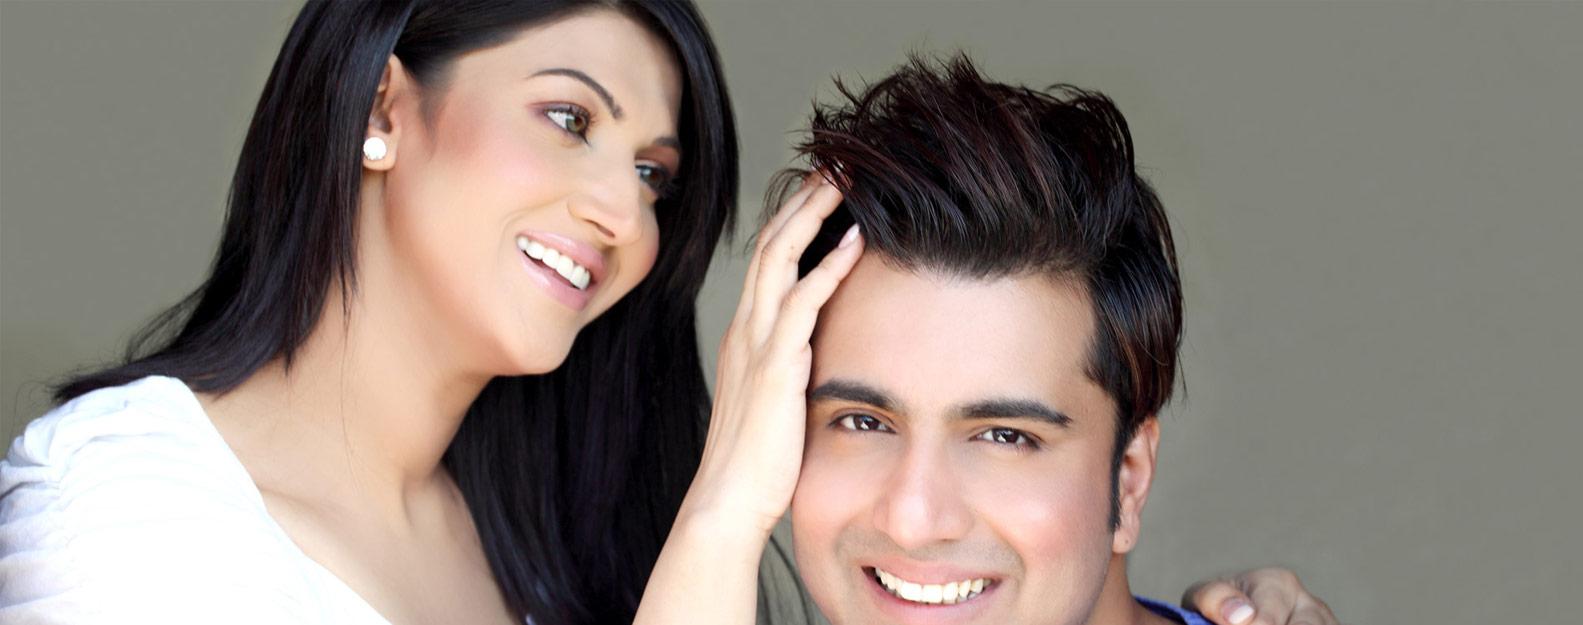 Looks Enhance Hair Skin Clinic Hair Treatment Hair Transplant